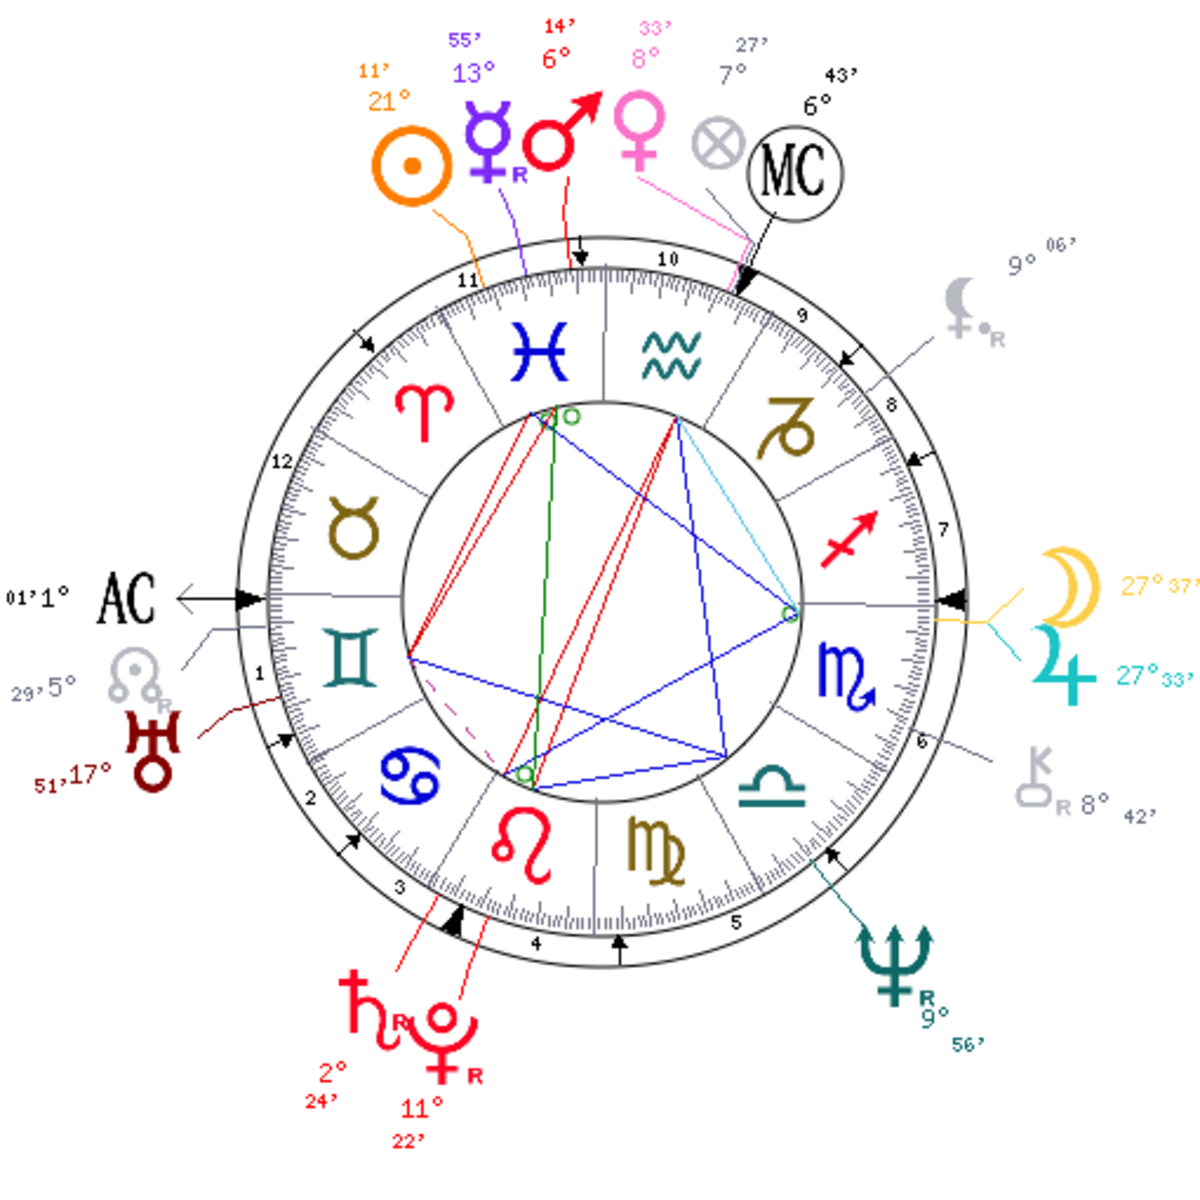 A copy of Mitt Romney's Astrology Chart